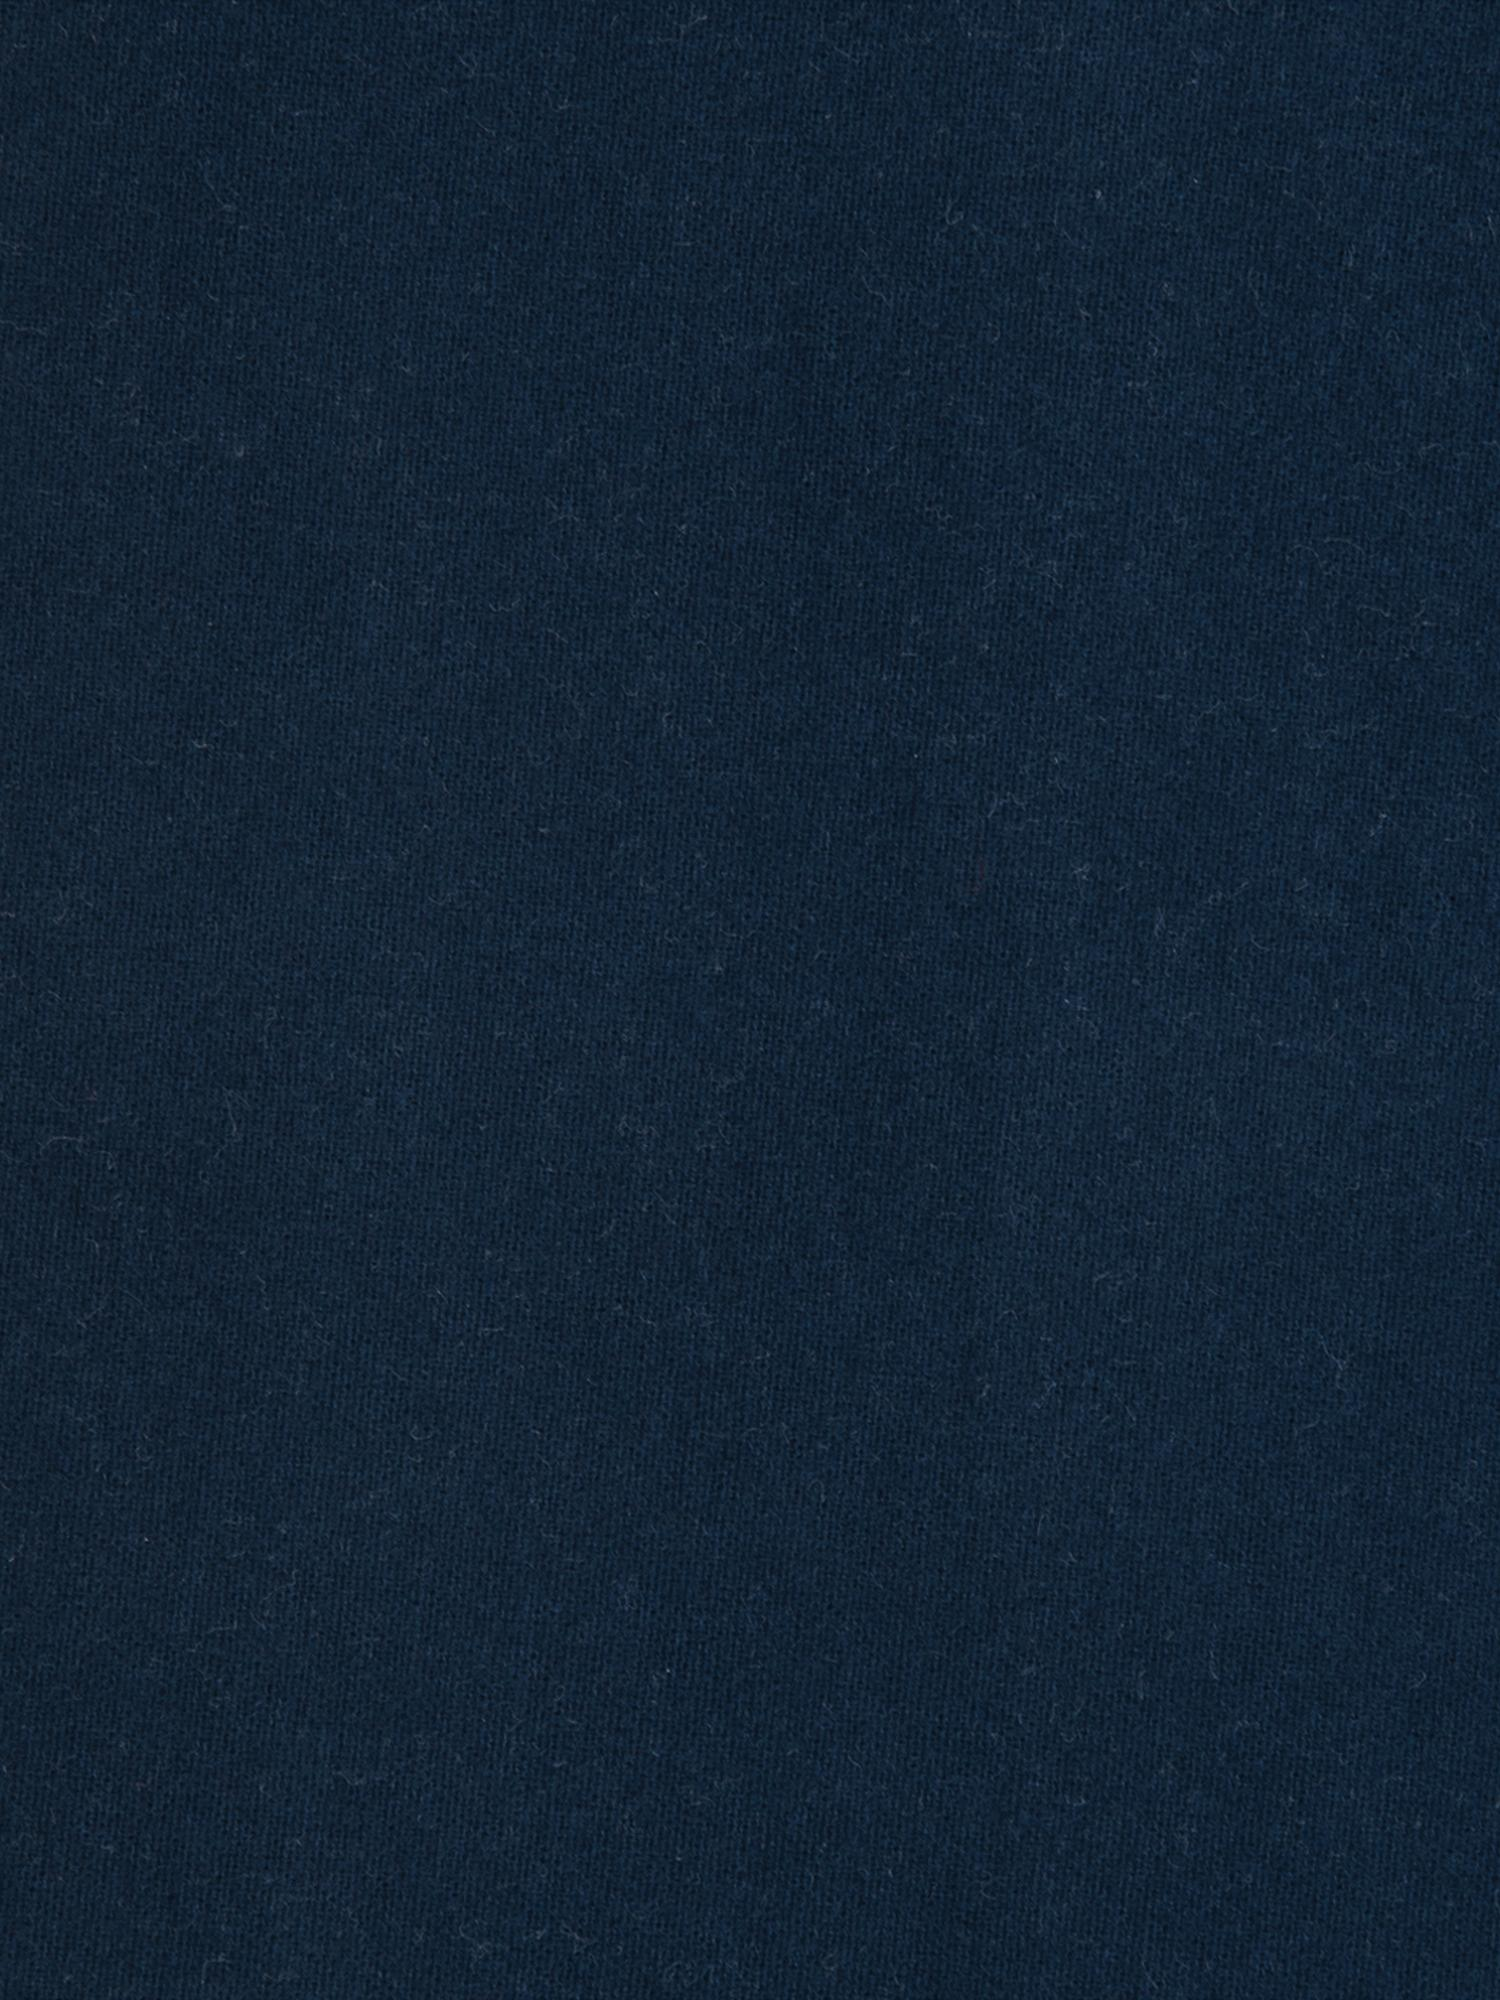 Spannbettlaken Biba in Navyblau, Flanell, Webart: Flanell, Navyblau, 180 x 200 cm